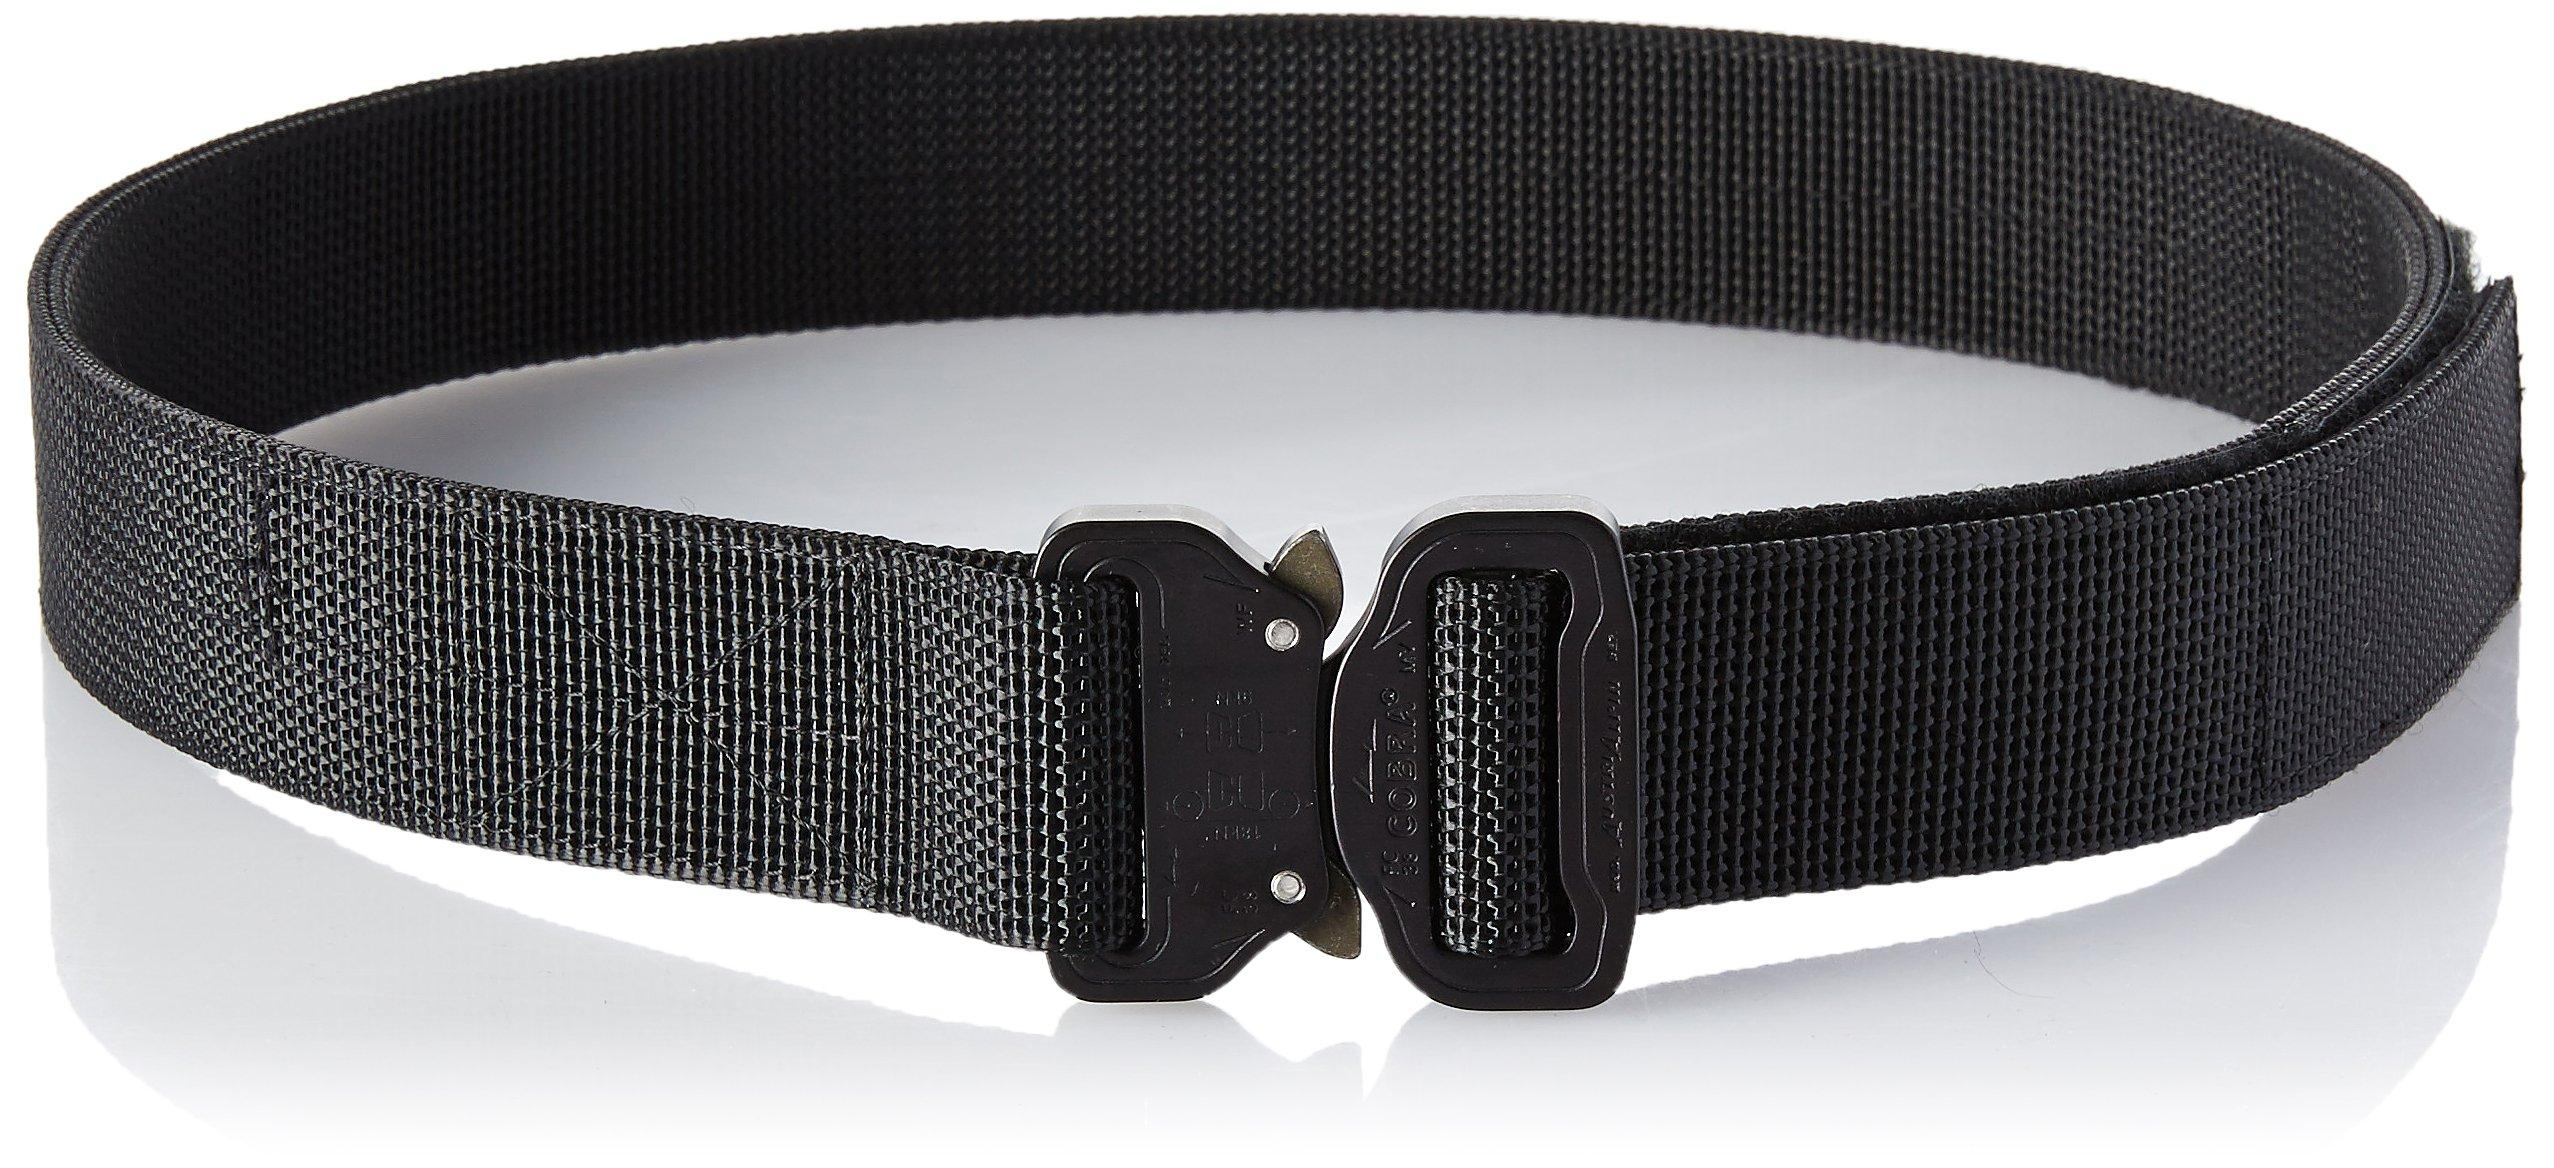 Propper Men's Rapid Release Belt, Black, Medium